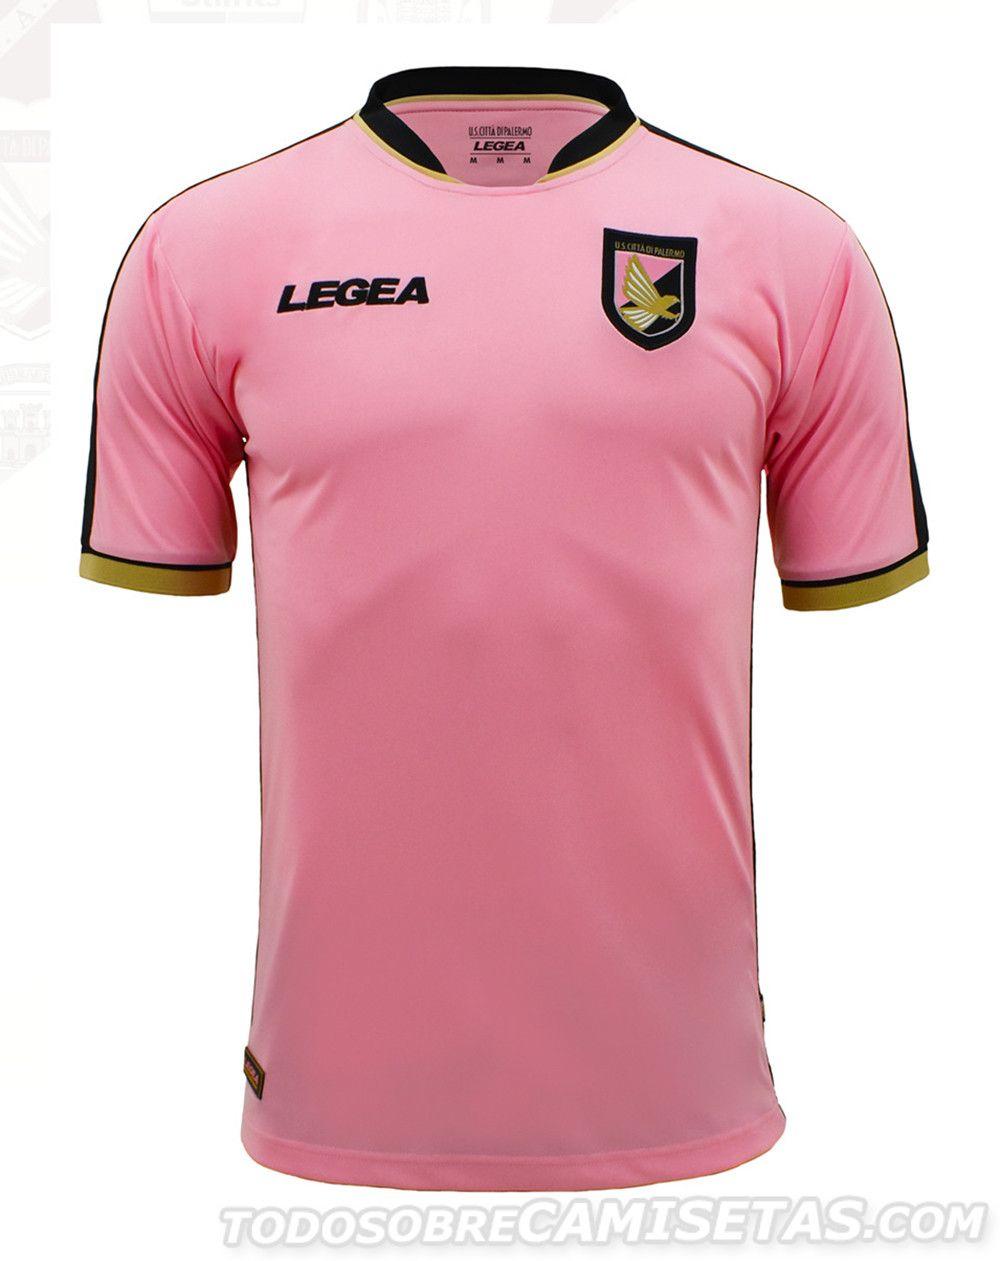 8611e6e0b8 US Città di Palermo Legea Kits 2018-19   Football (soccer)   Mens ...